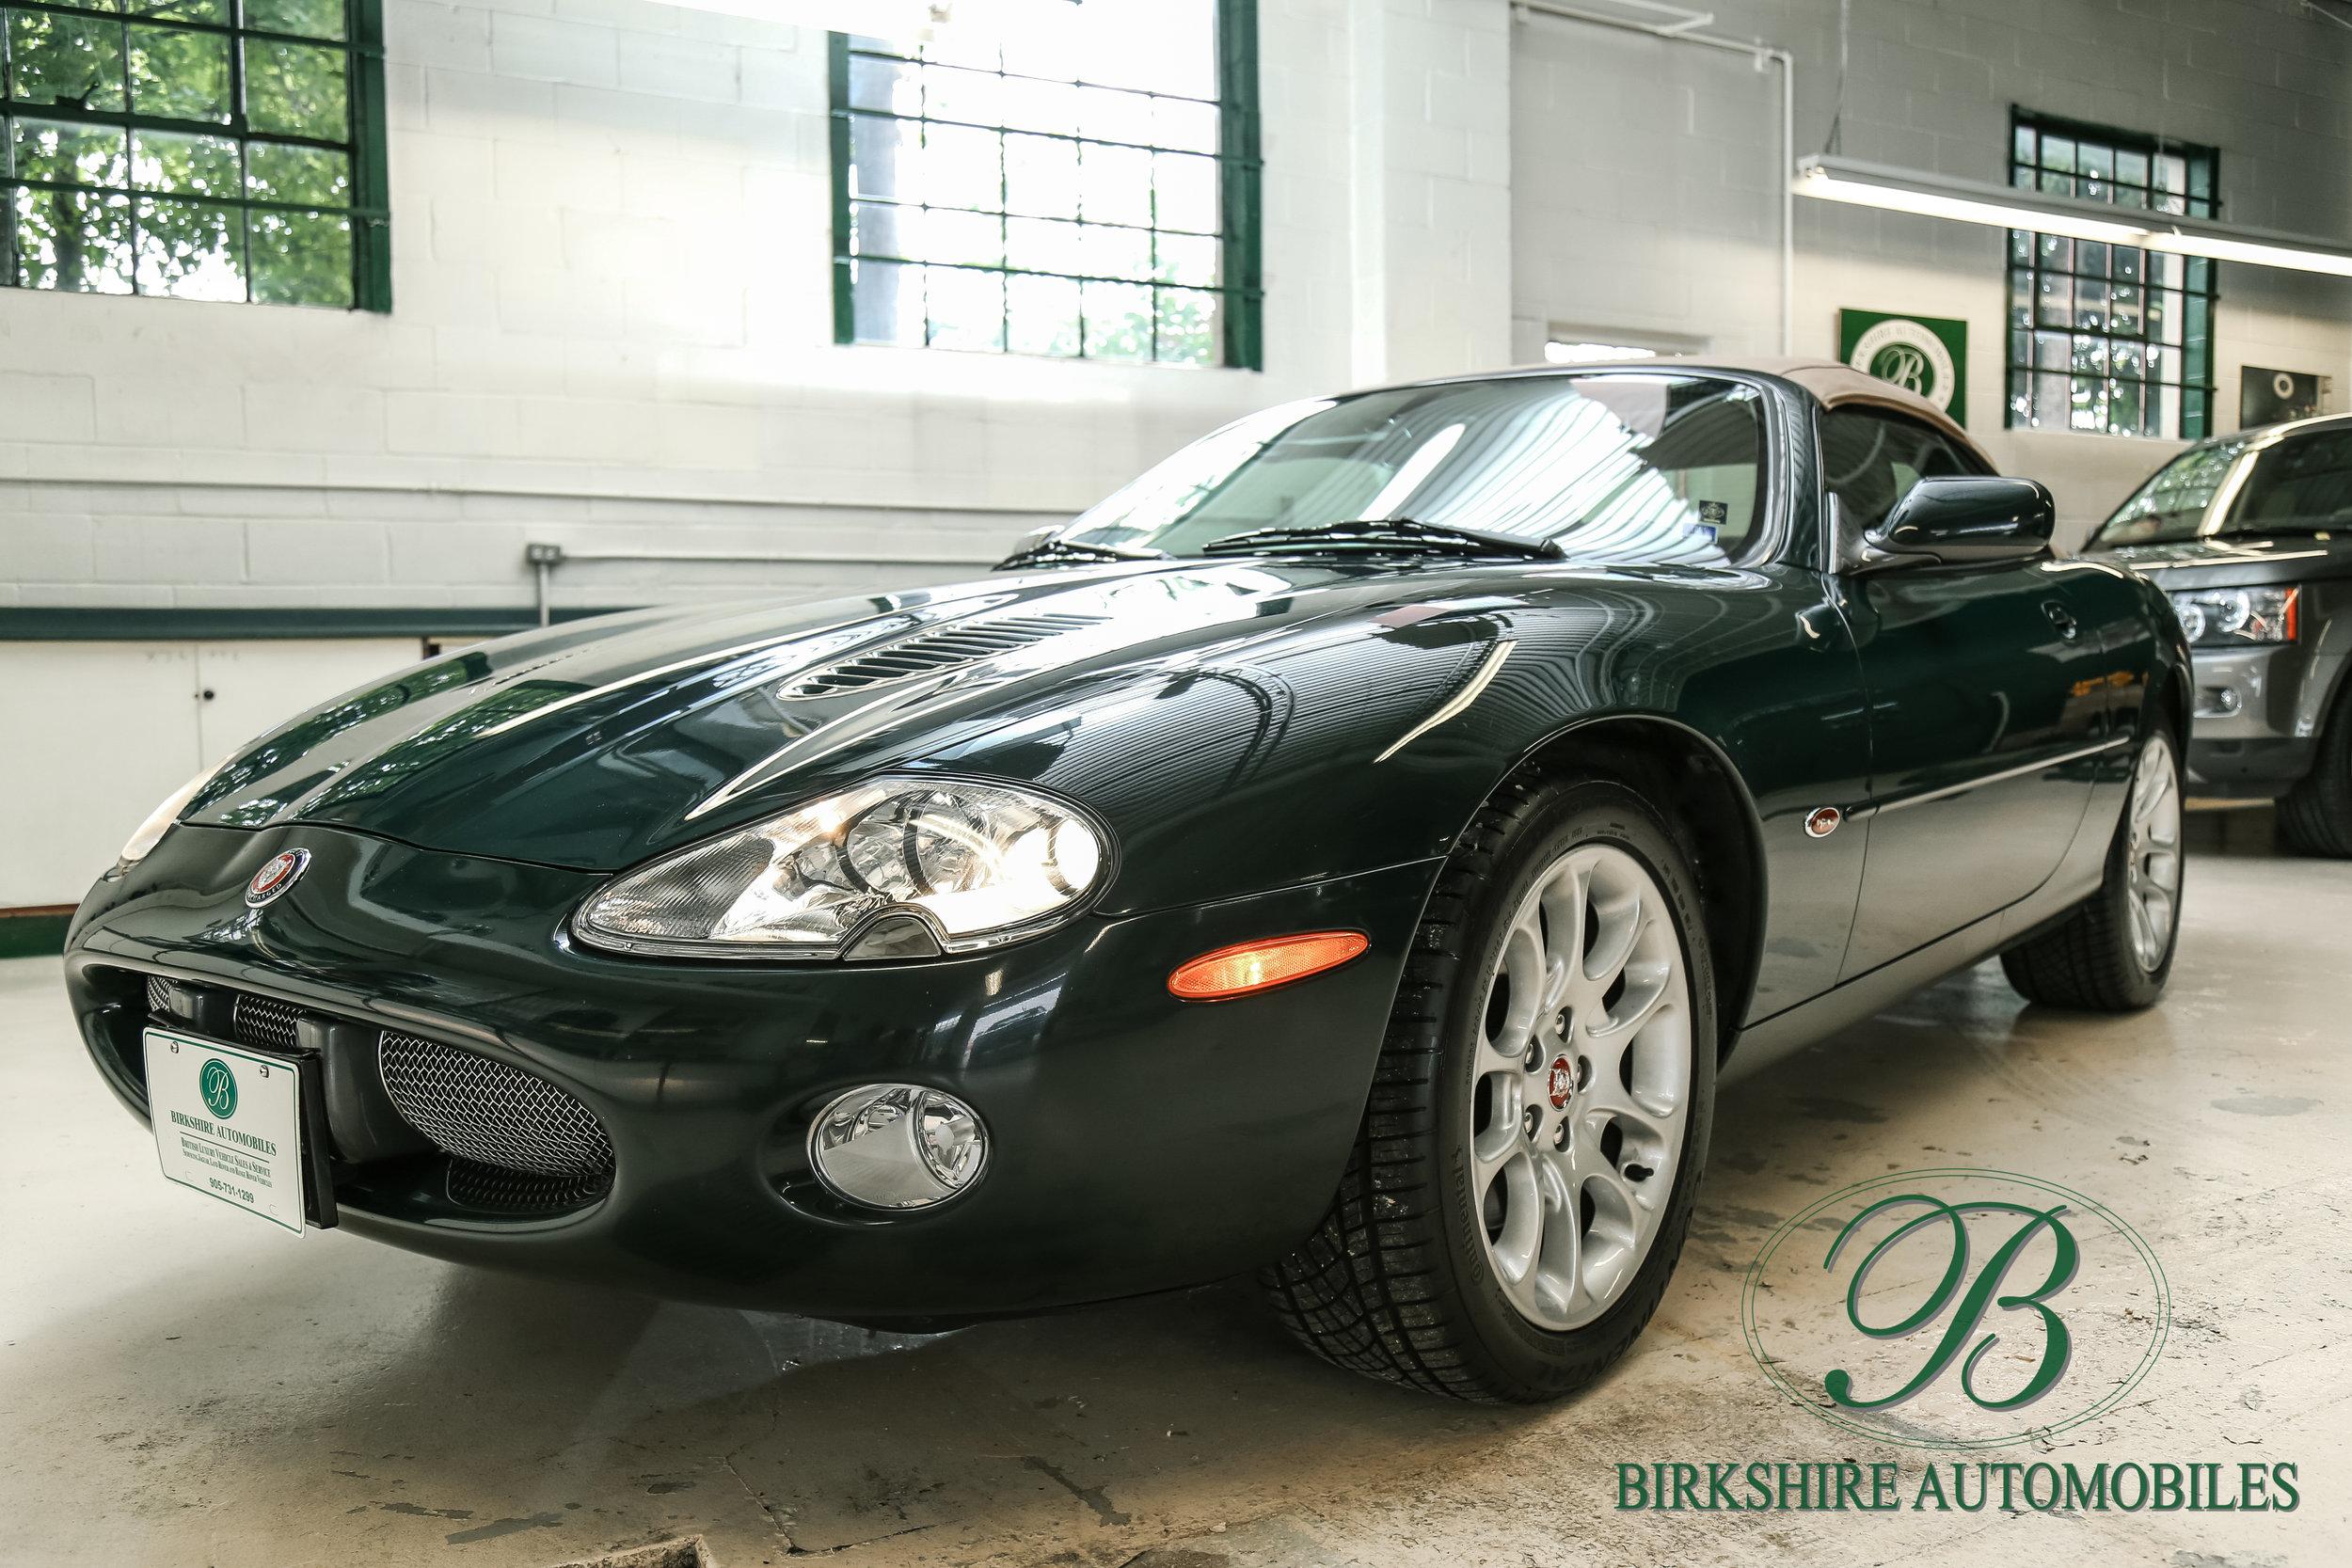 Birkshire Automobiles-2001 Jaguar XKR Convertible (11).jpg